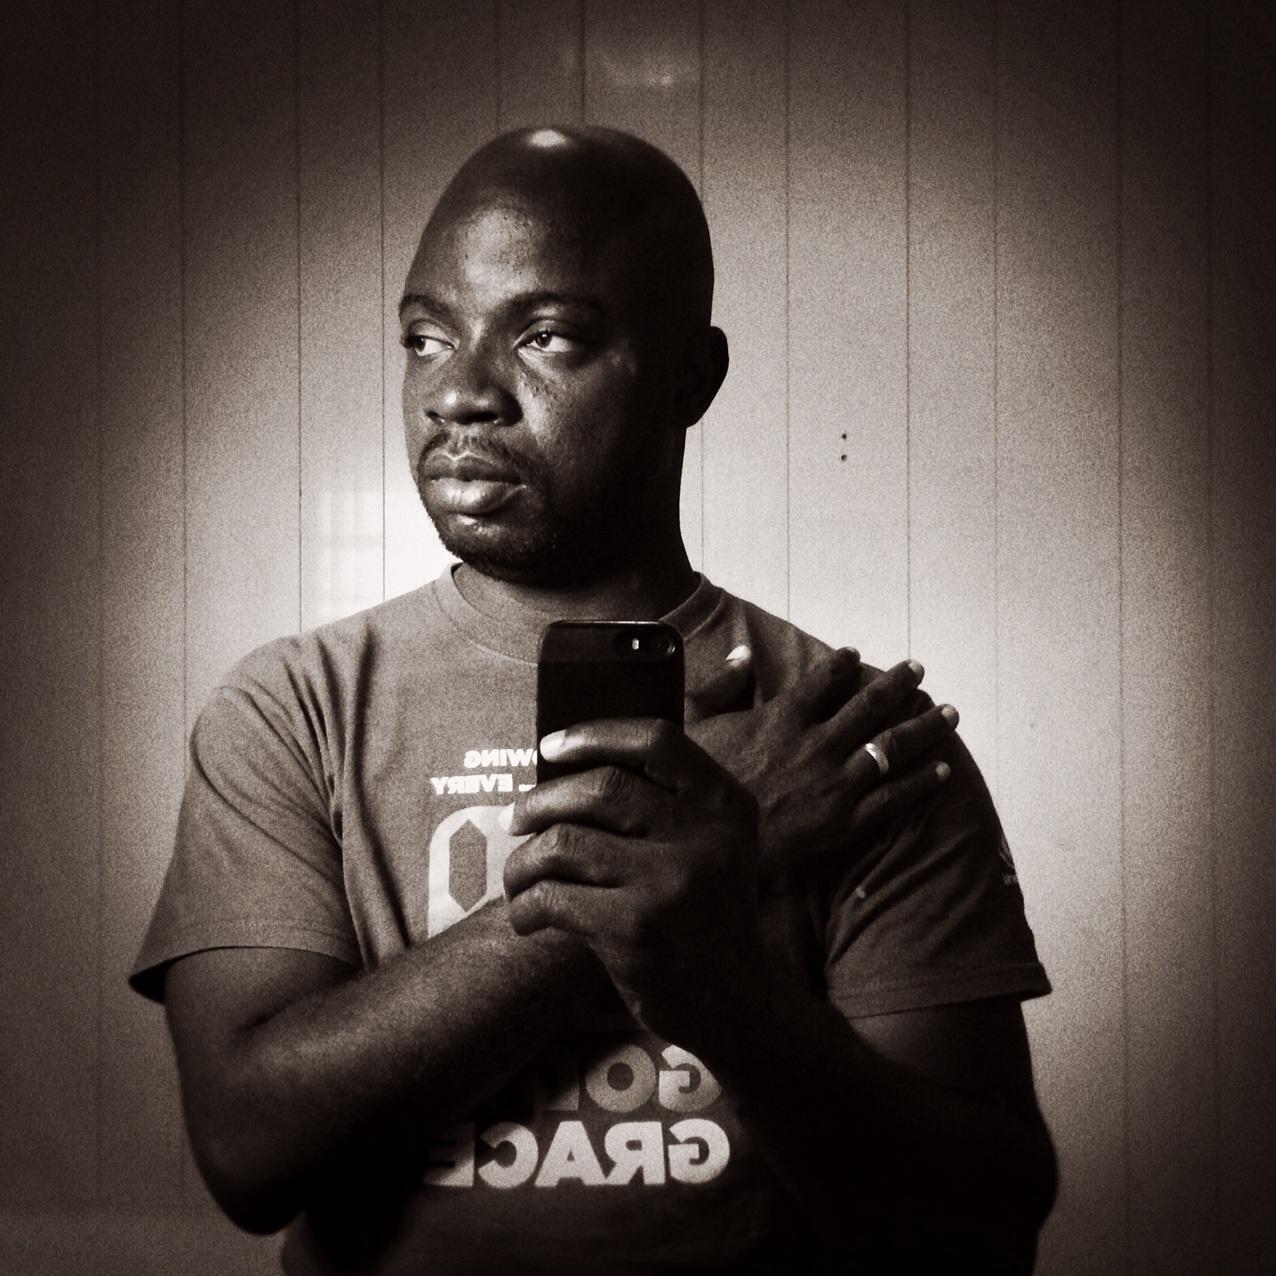 NANA KOFI ACQUAH Accra, Ghana  @EverydayAfrica  nkacquah.com   @africashowboy